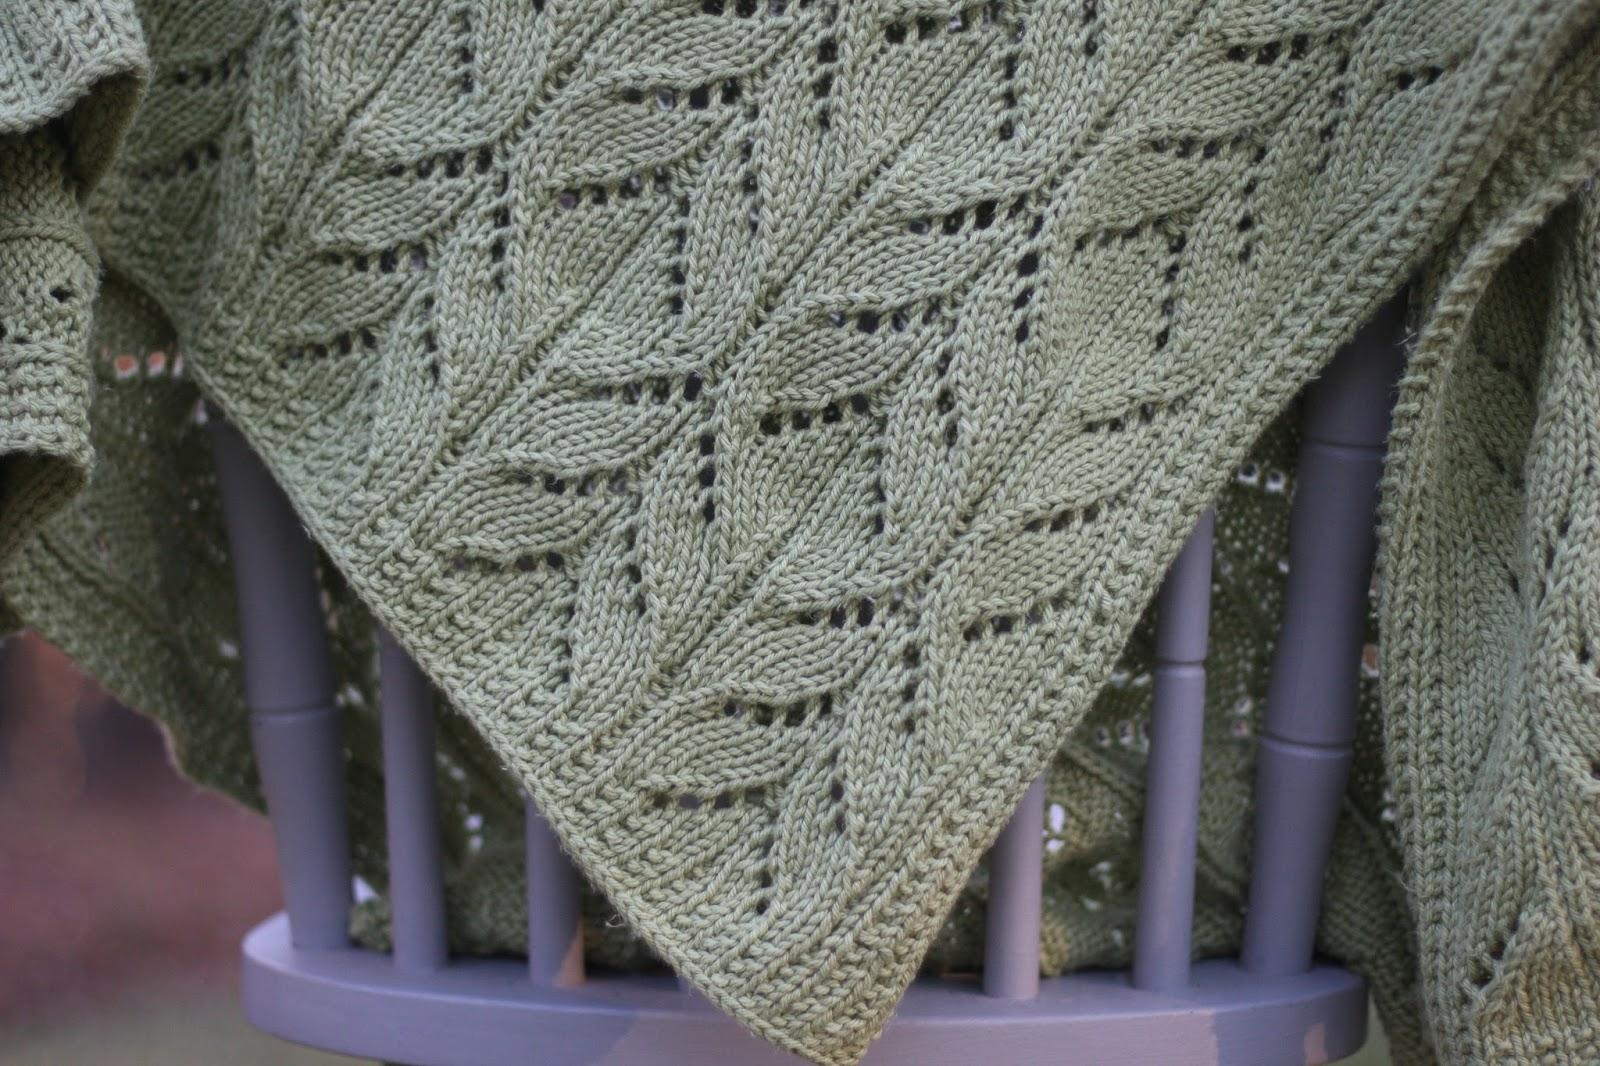 Modern Lace Baby Blanket Knitting Pattern Ornament - Decke Stricken ...